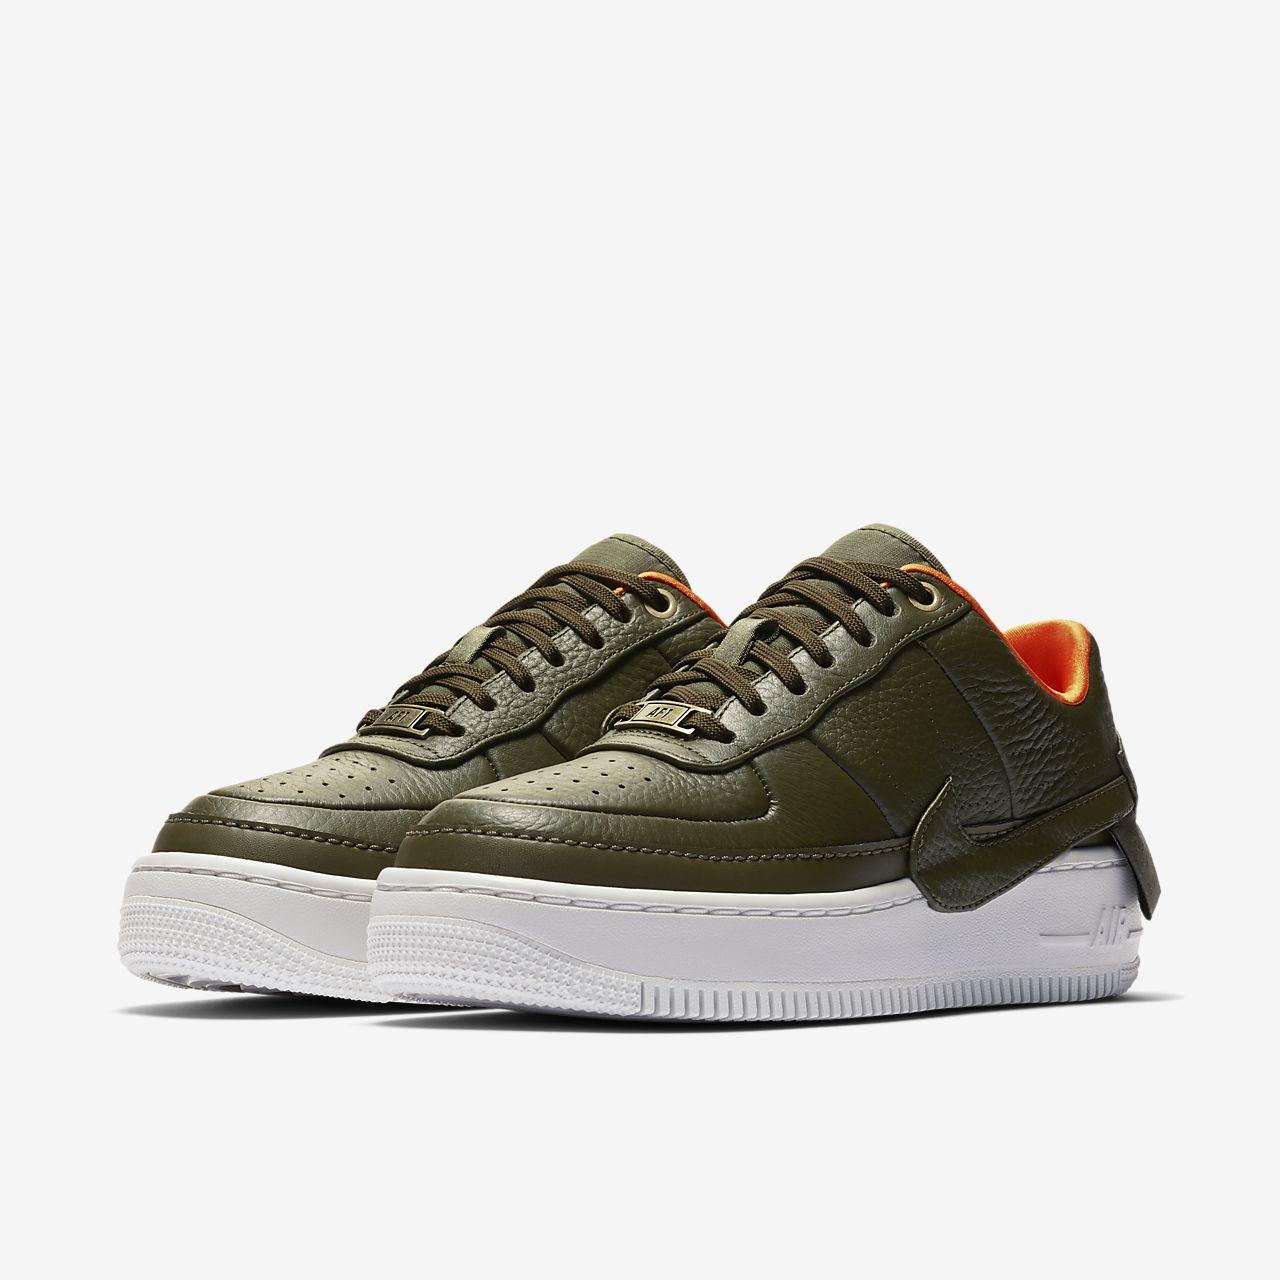 pretty nice e8bc6 2e2a5 ... Nike Air Force 1 Jester XX Premium Women s Shoe